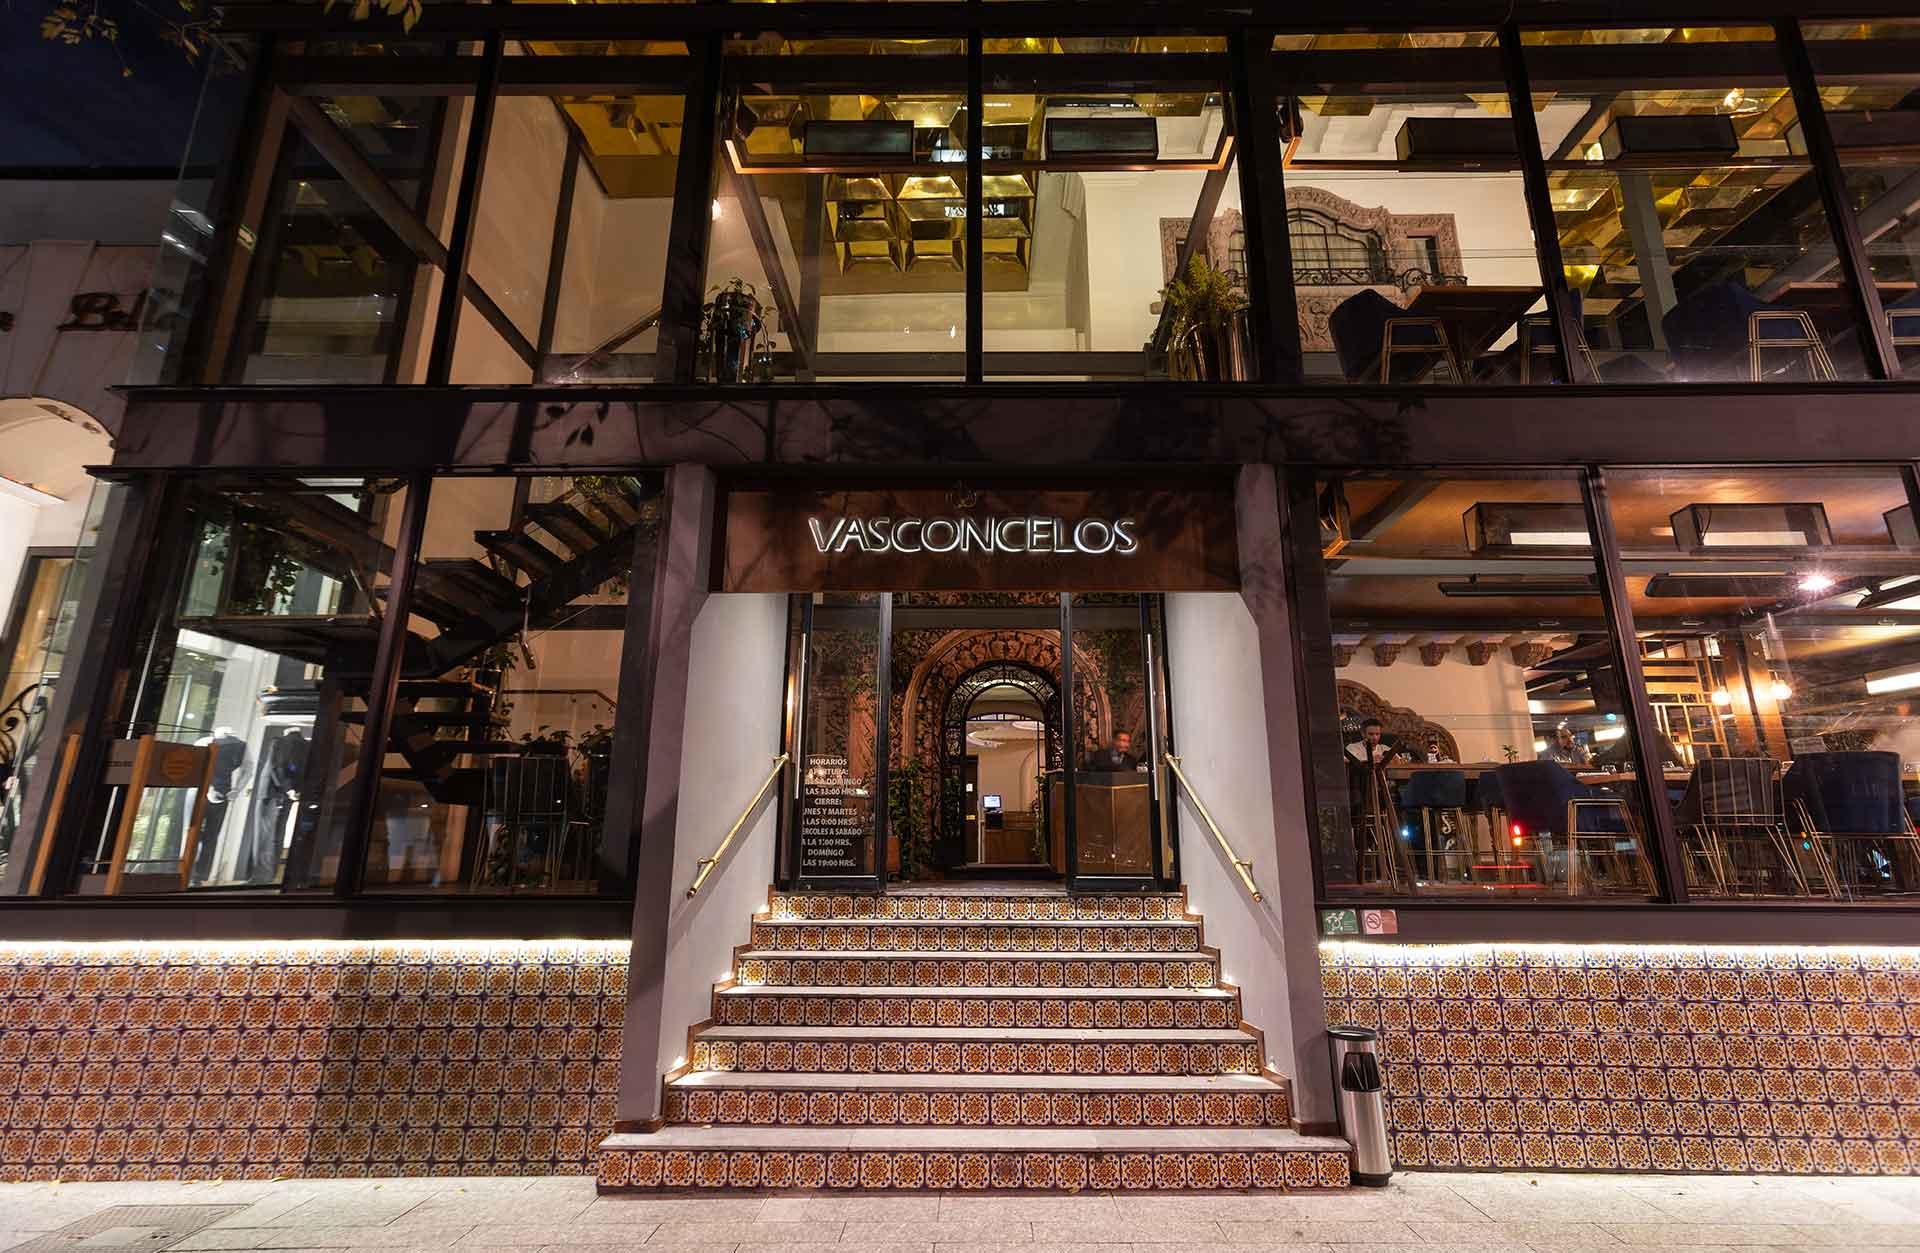 restaurante Vasconcelos